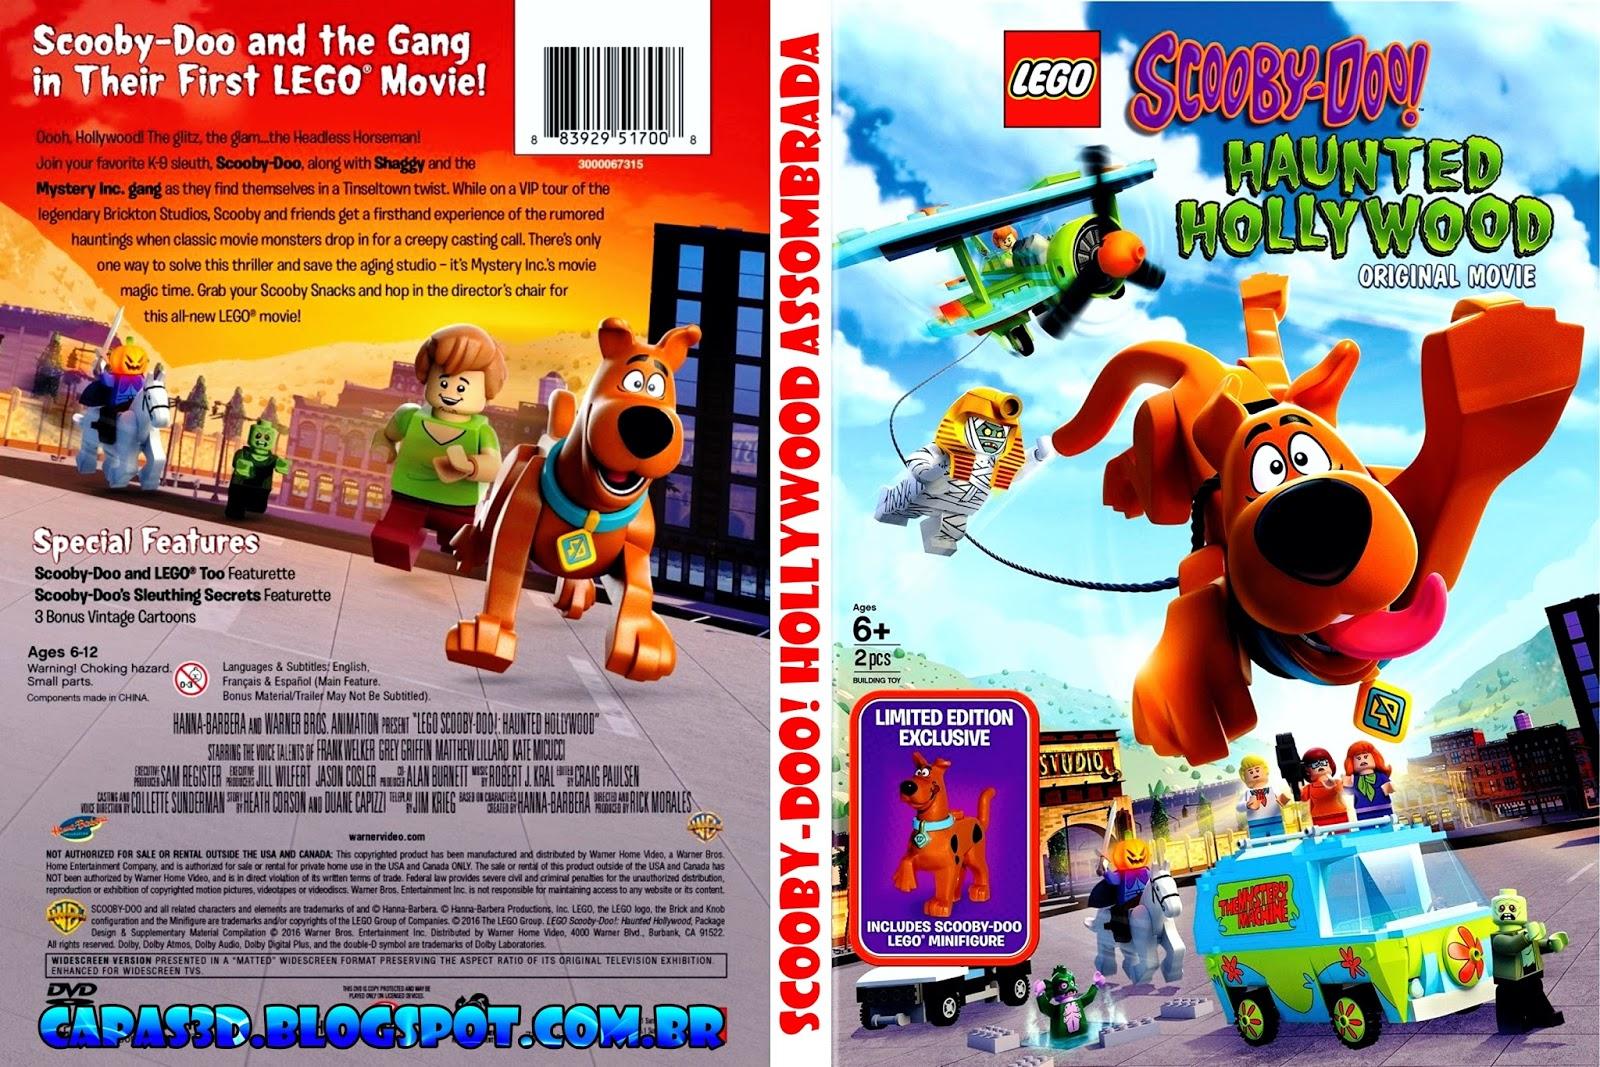 Lego Scooby-Doo! Hollywood Assombrada DVD-R Lego 2BScooby Doo 2521 2BHollywood 2BAssombrada 2BDVD R 2BXANDAODOWNLOAD